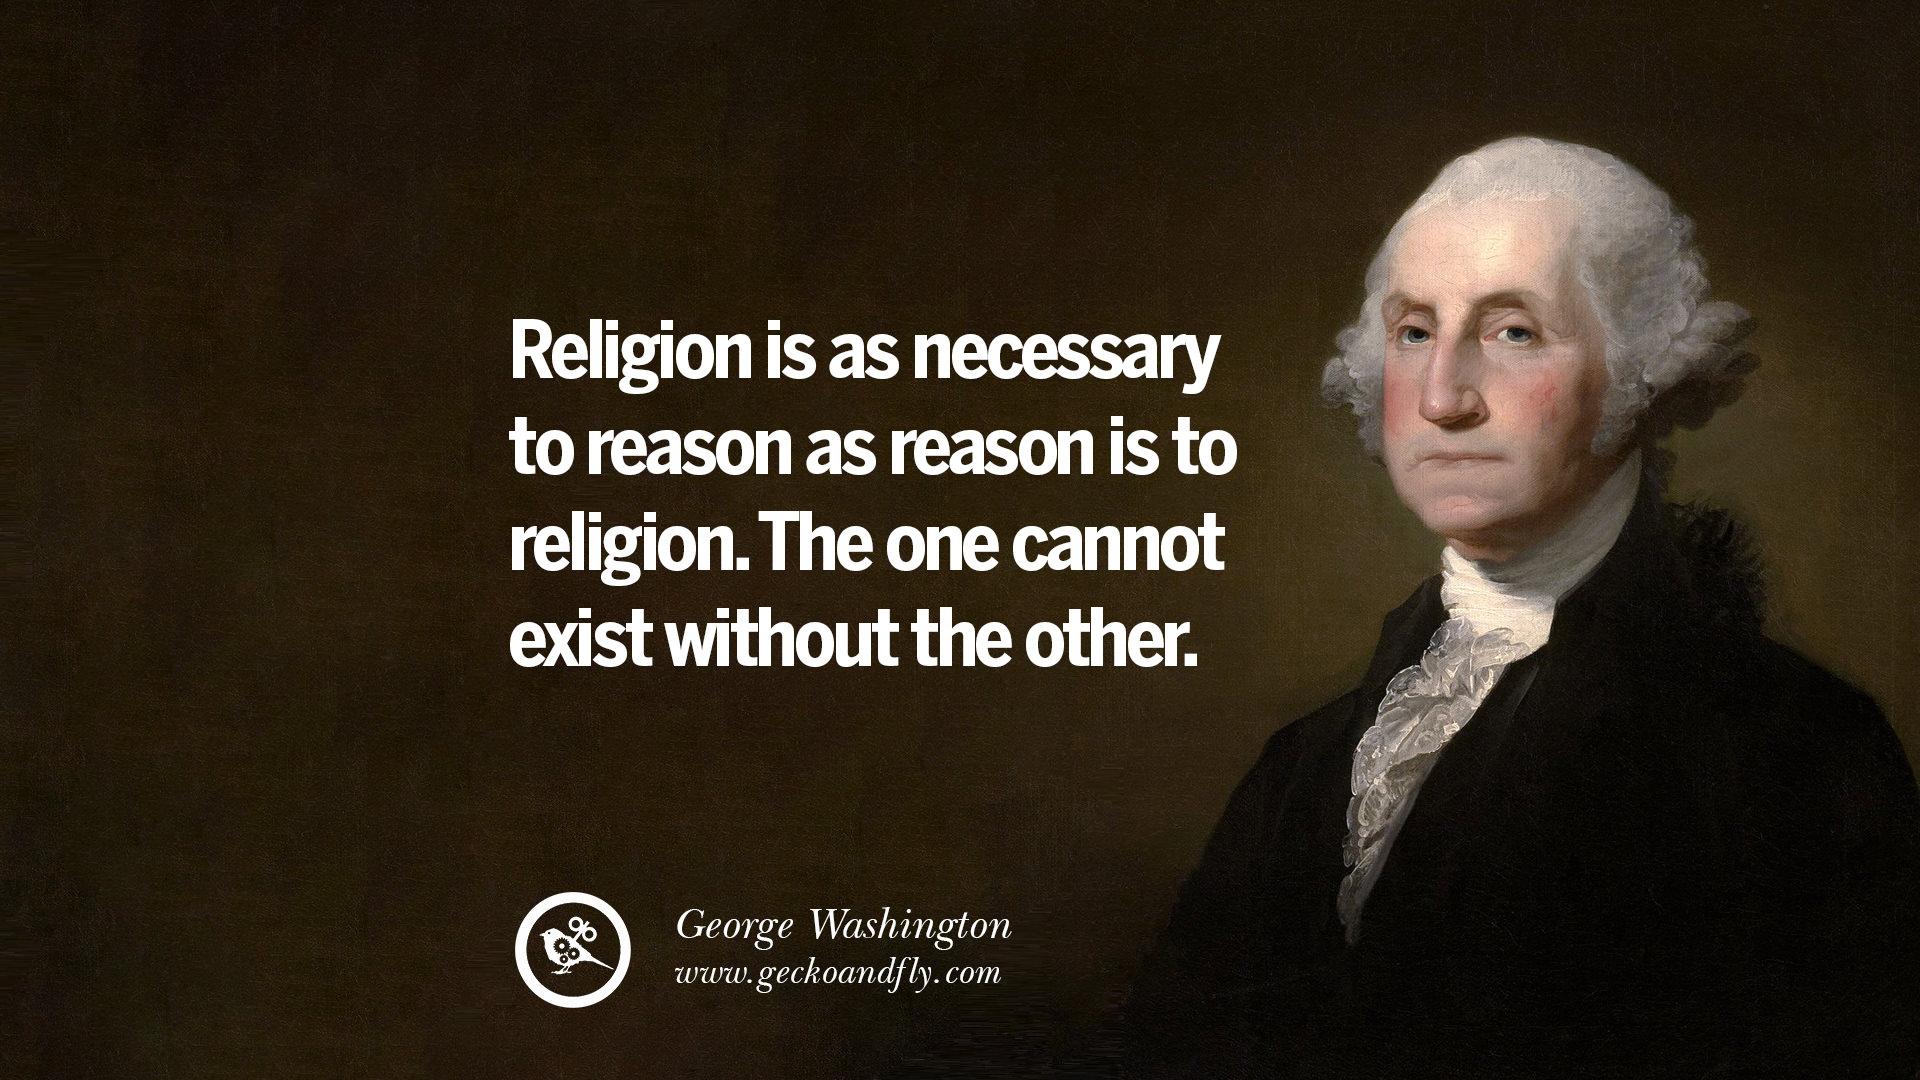 Faith Without Reason Quote: 20 Famous George Washington Quotes On Freedom, Faith